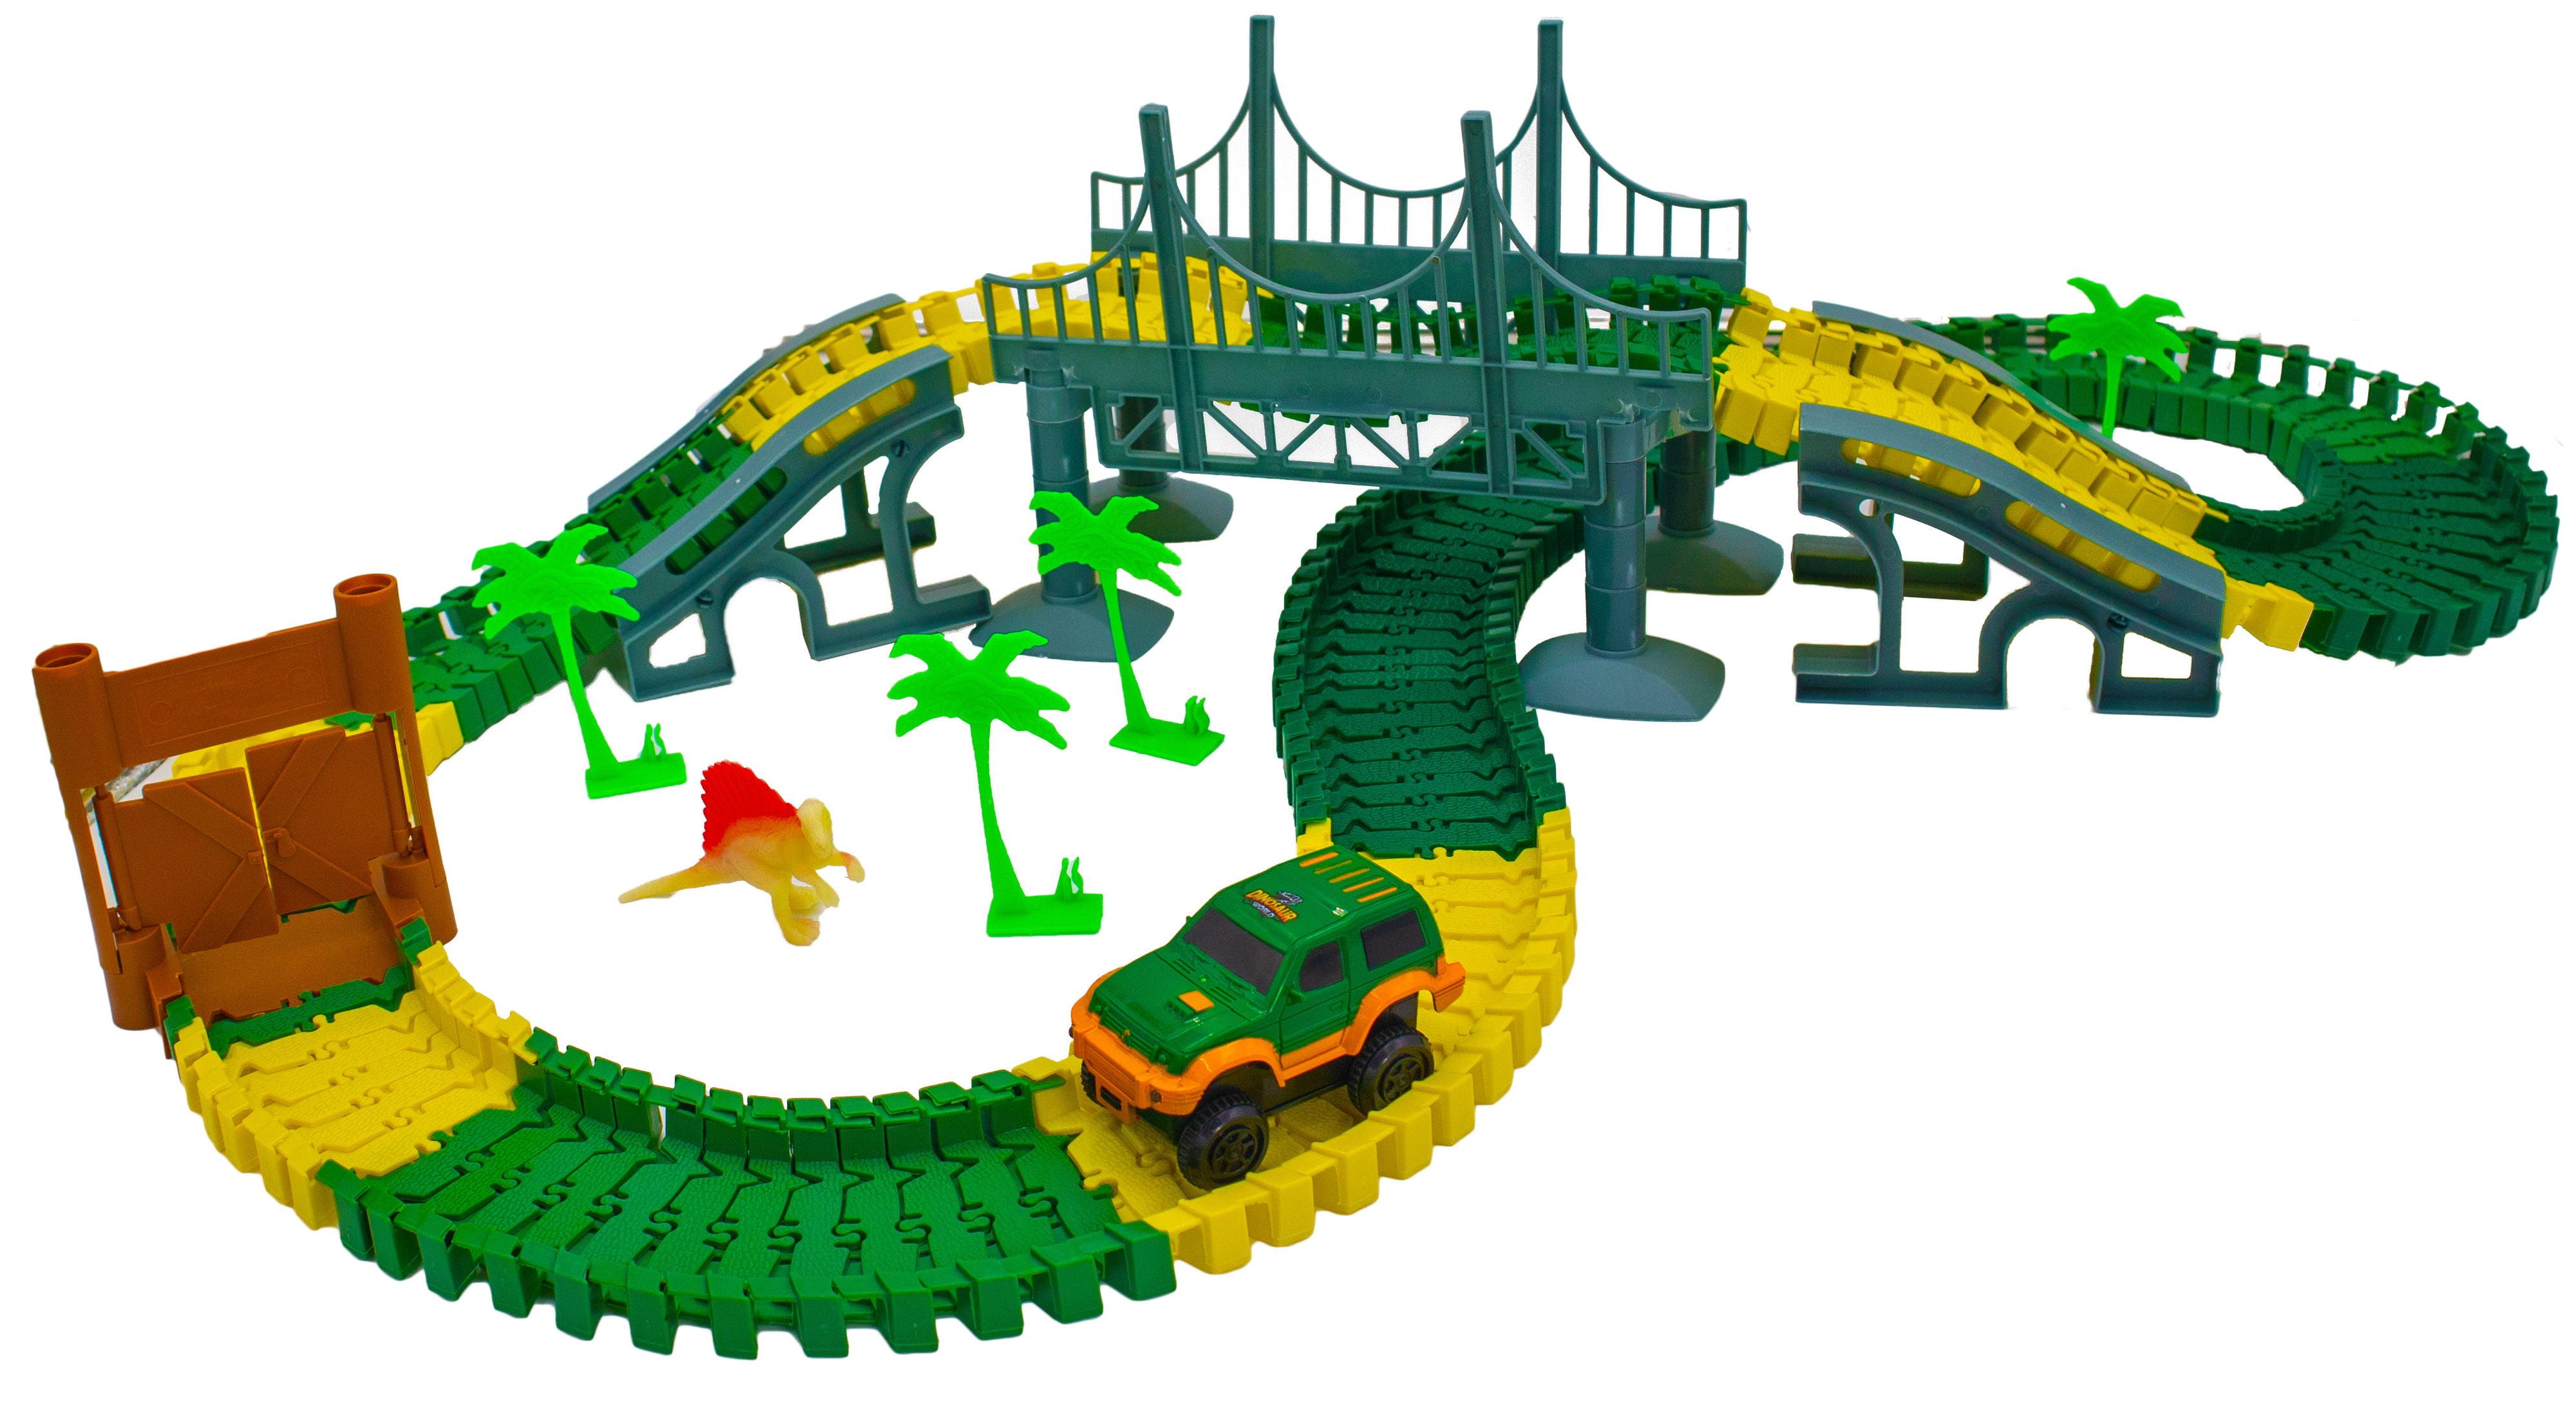 Magic Dinosaur Twisting Race Car Track Flexible Bending Glow In The Dark Traxs W Dino Slot Car Race Track Toy Walmart Com Walmart Com